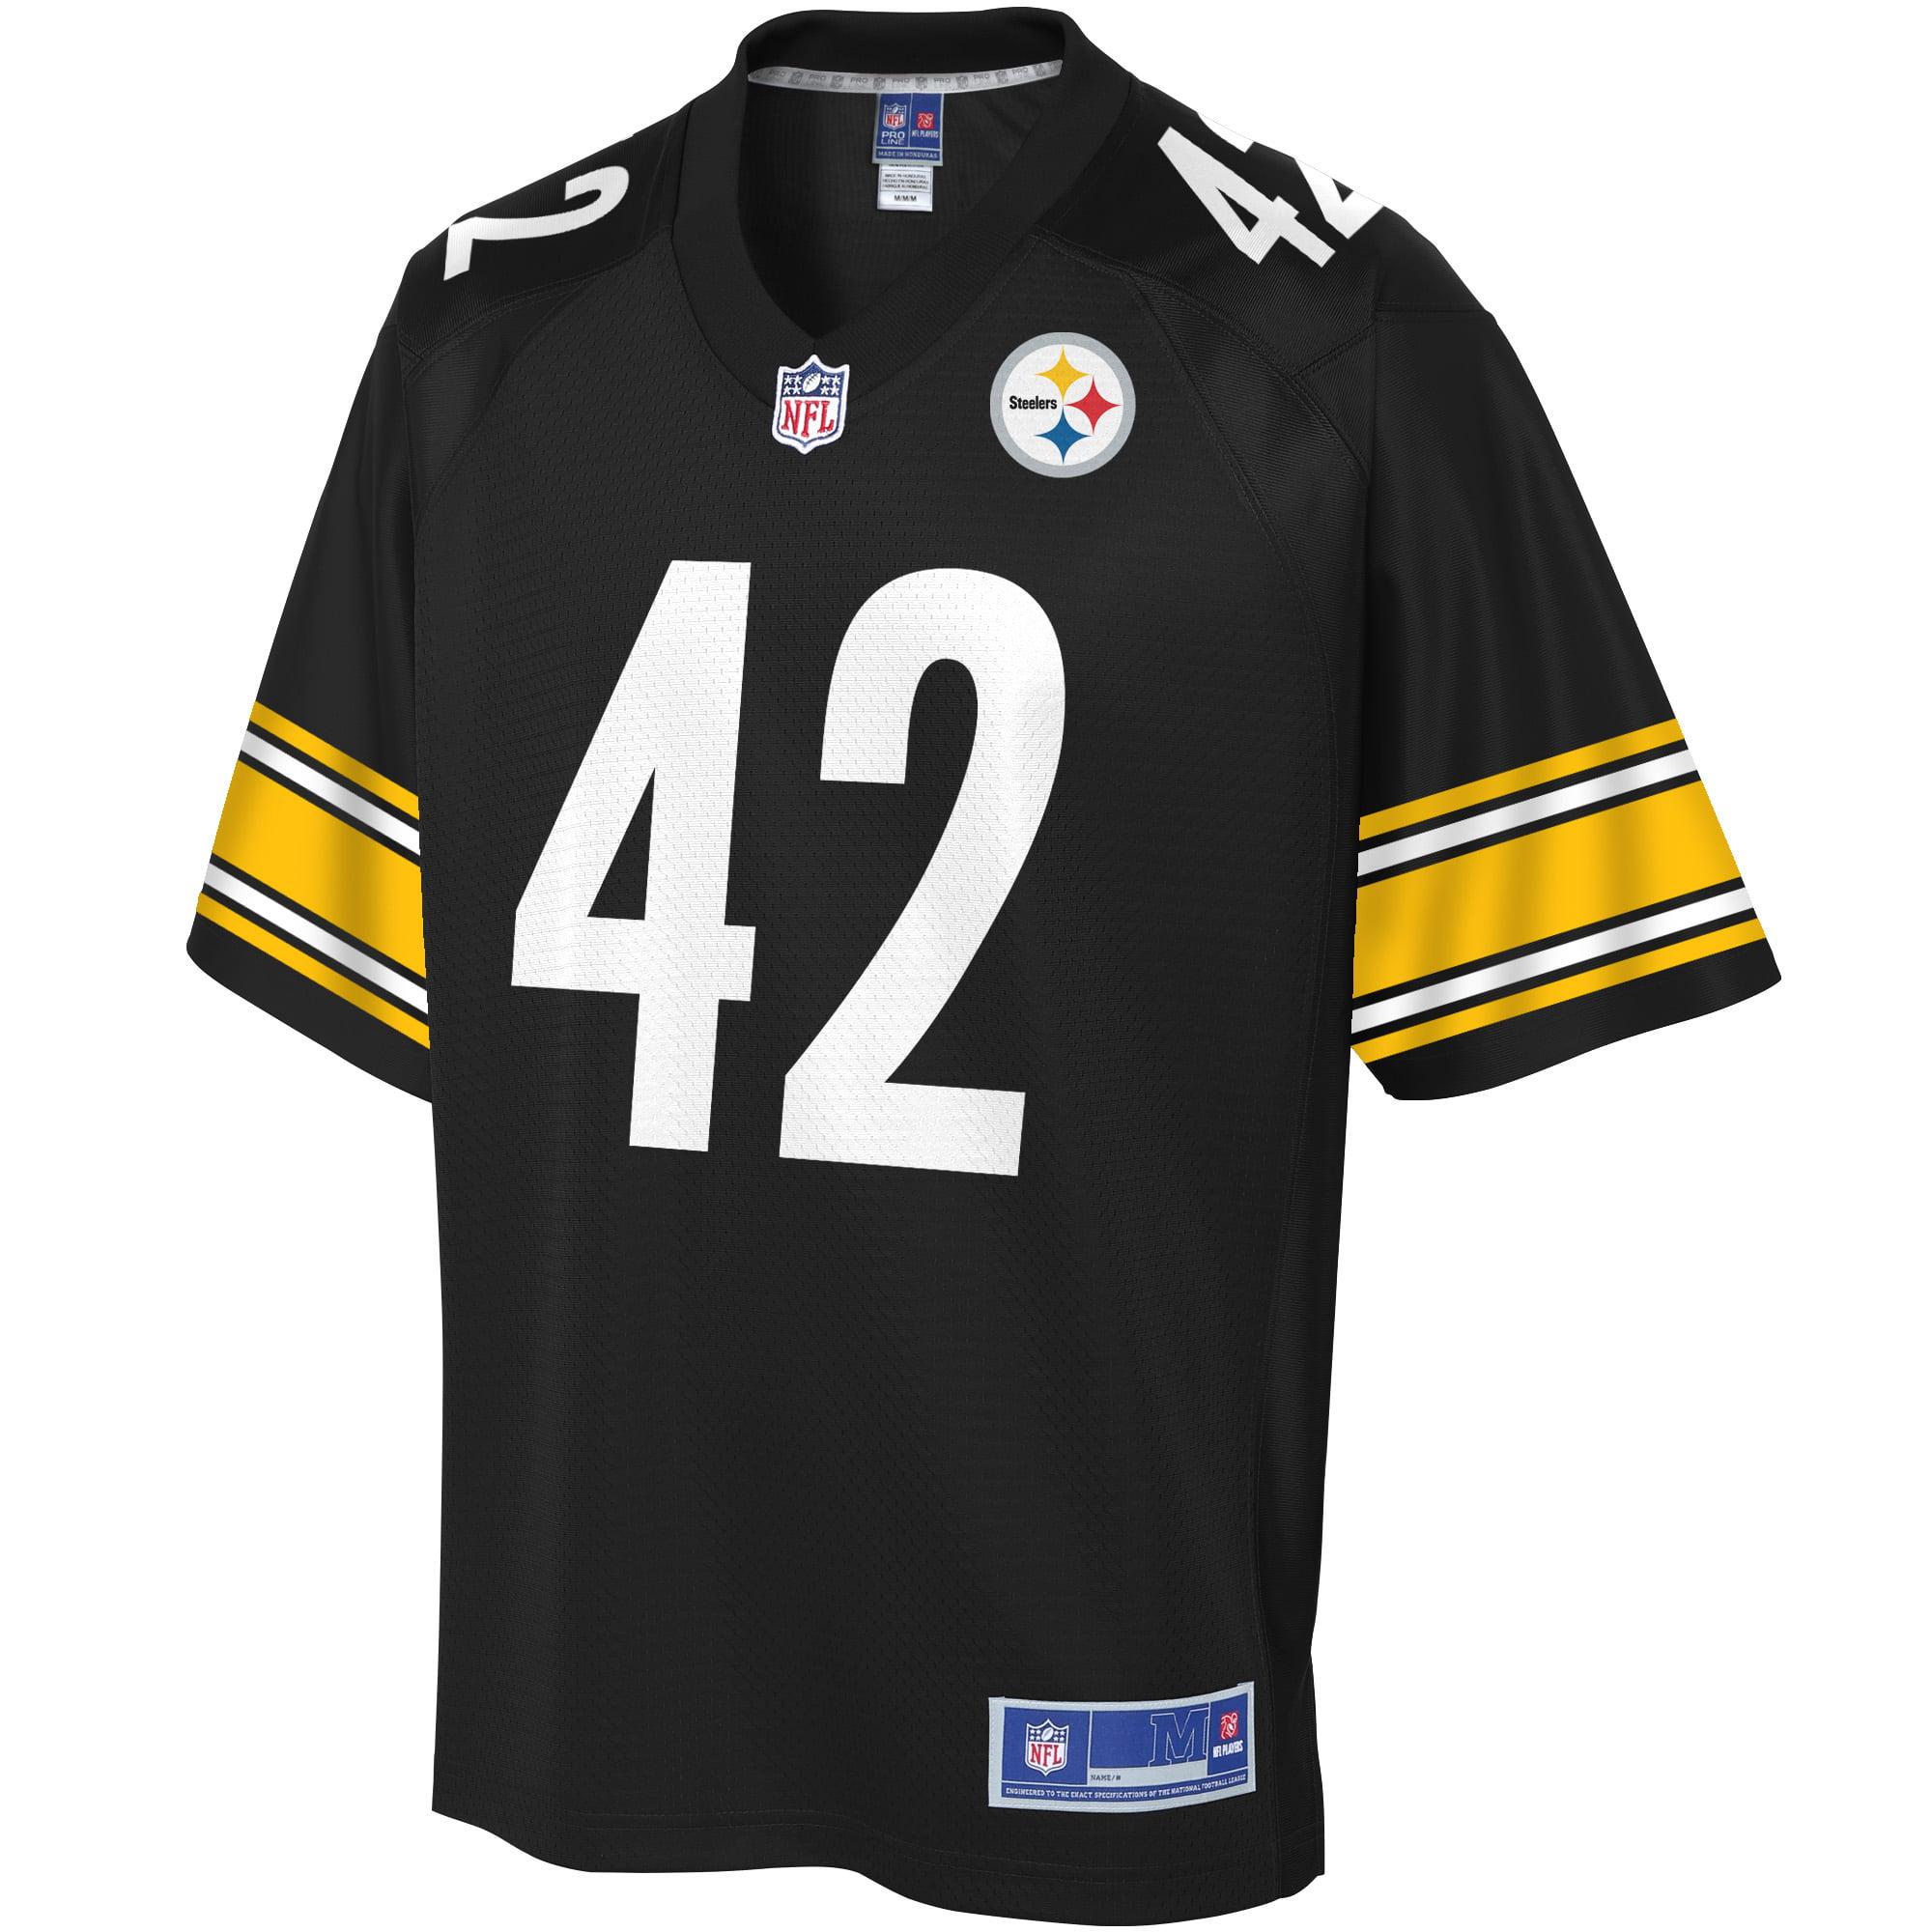 huge discount f5344 0f2fe Morgan Burnett Pittsburgh Steelers NFL Pro Line Player ...